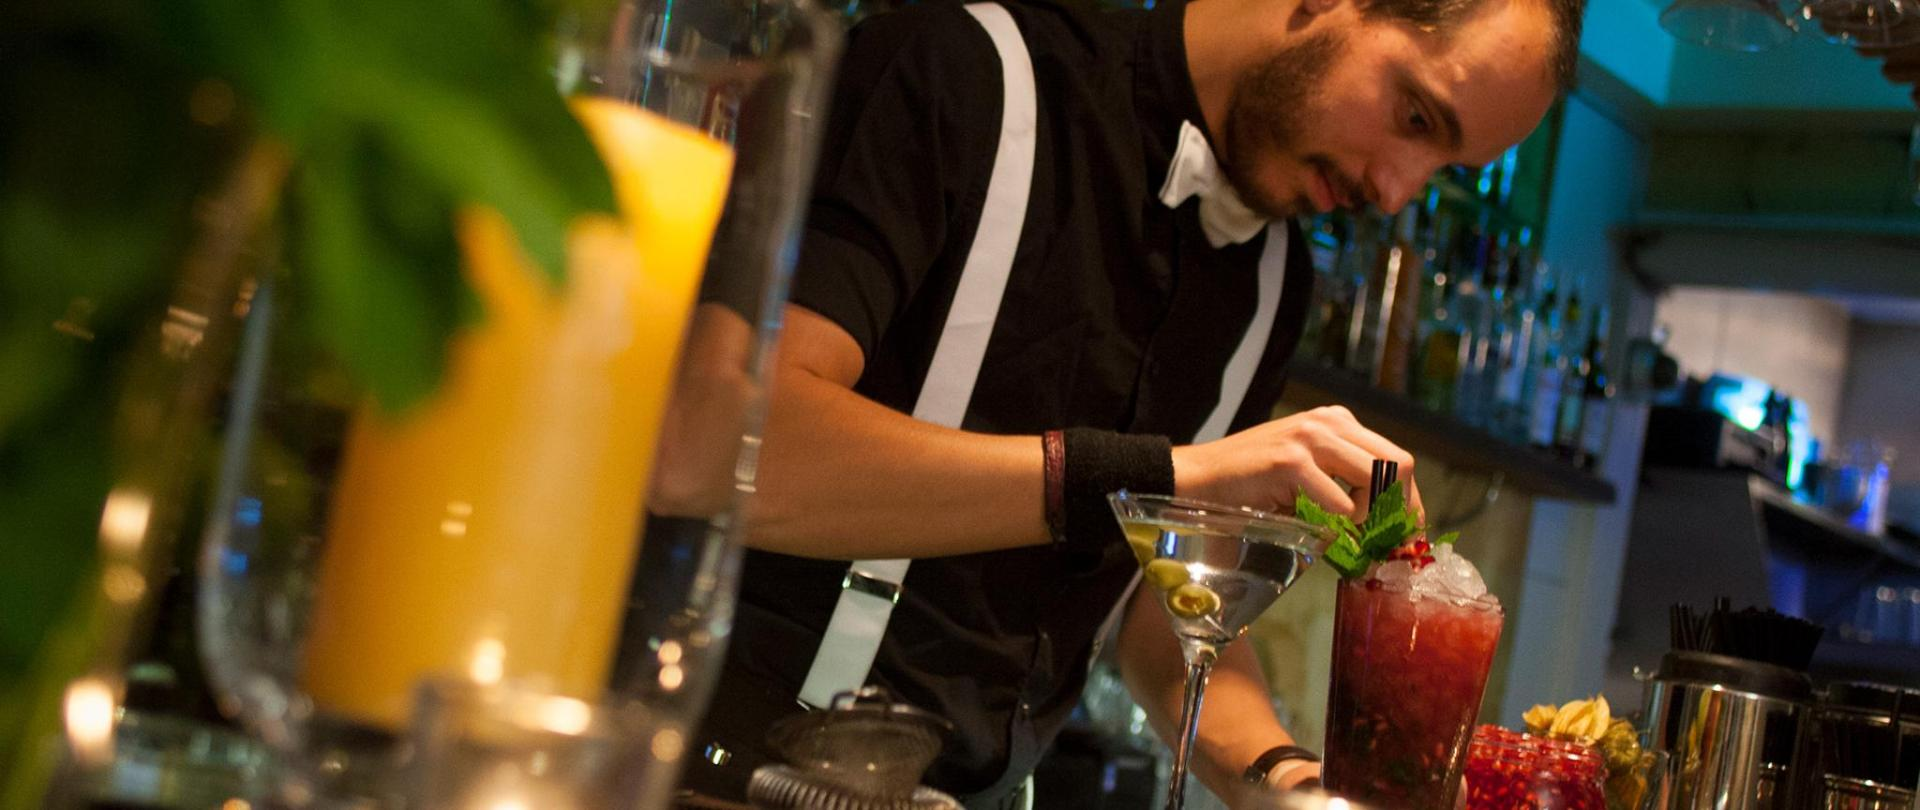 Cocktails-at-sub13.jpg